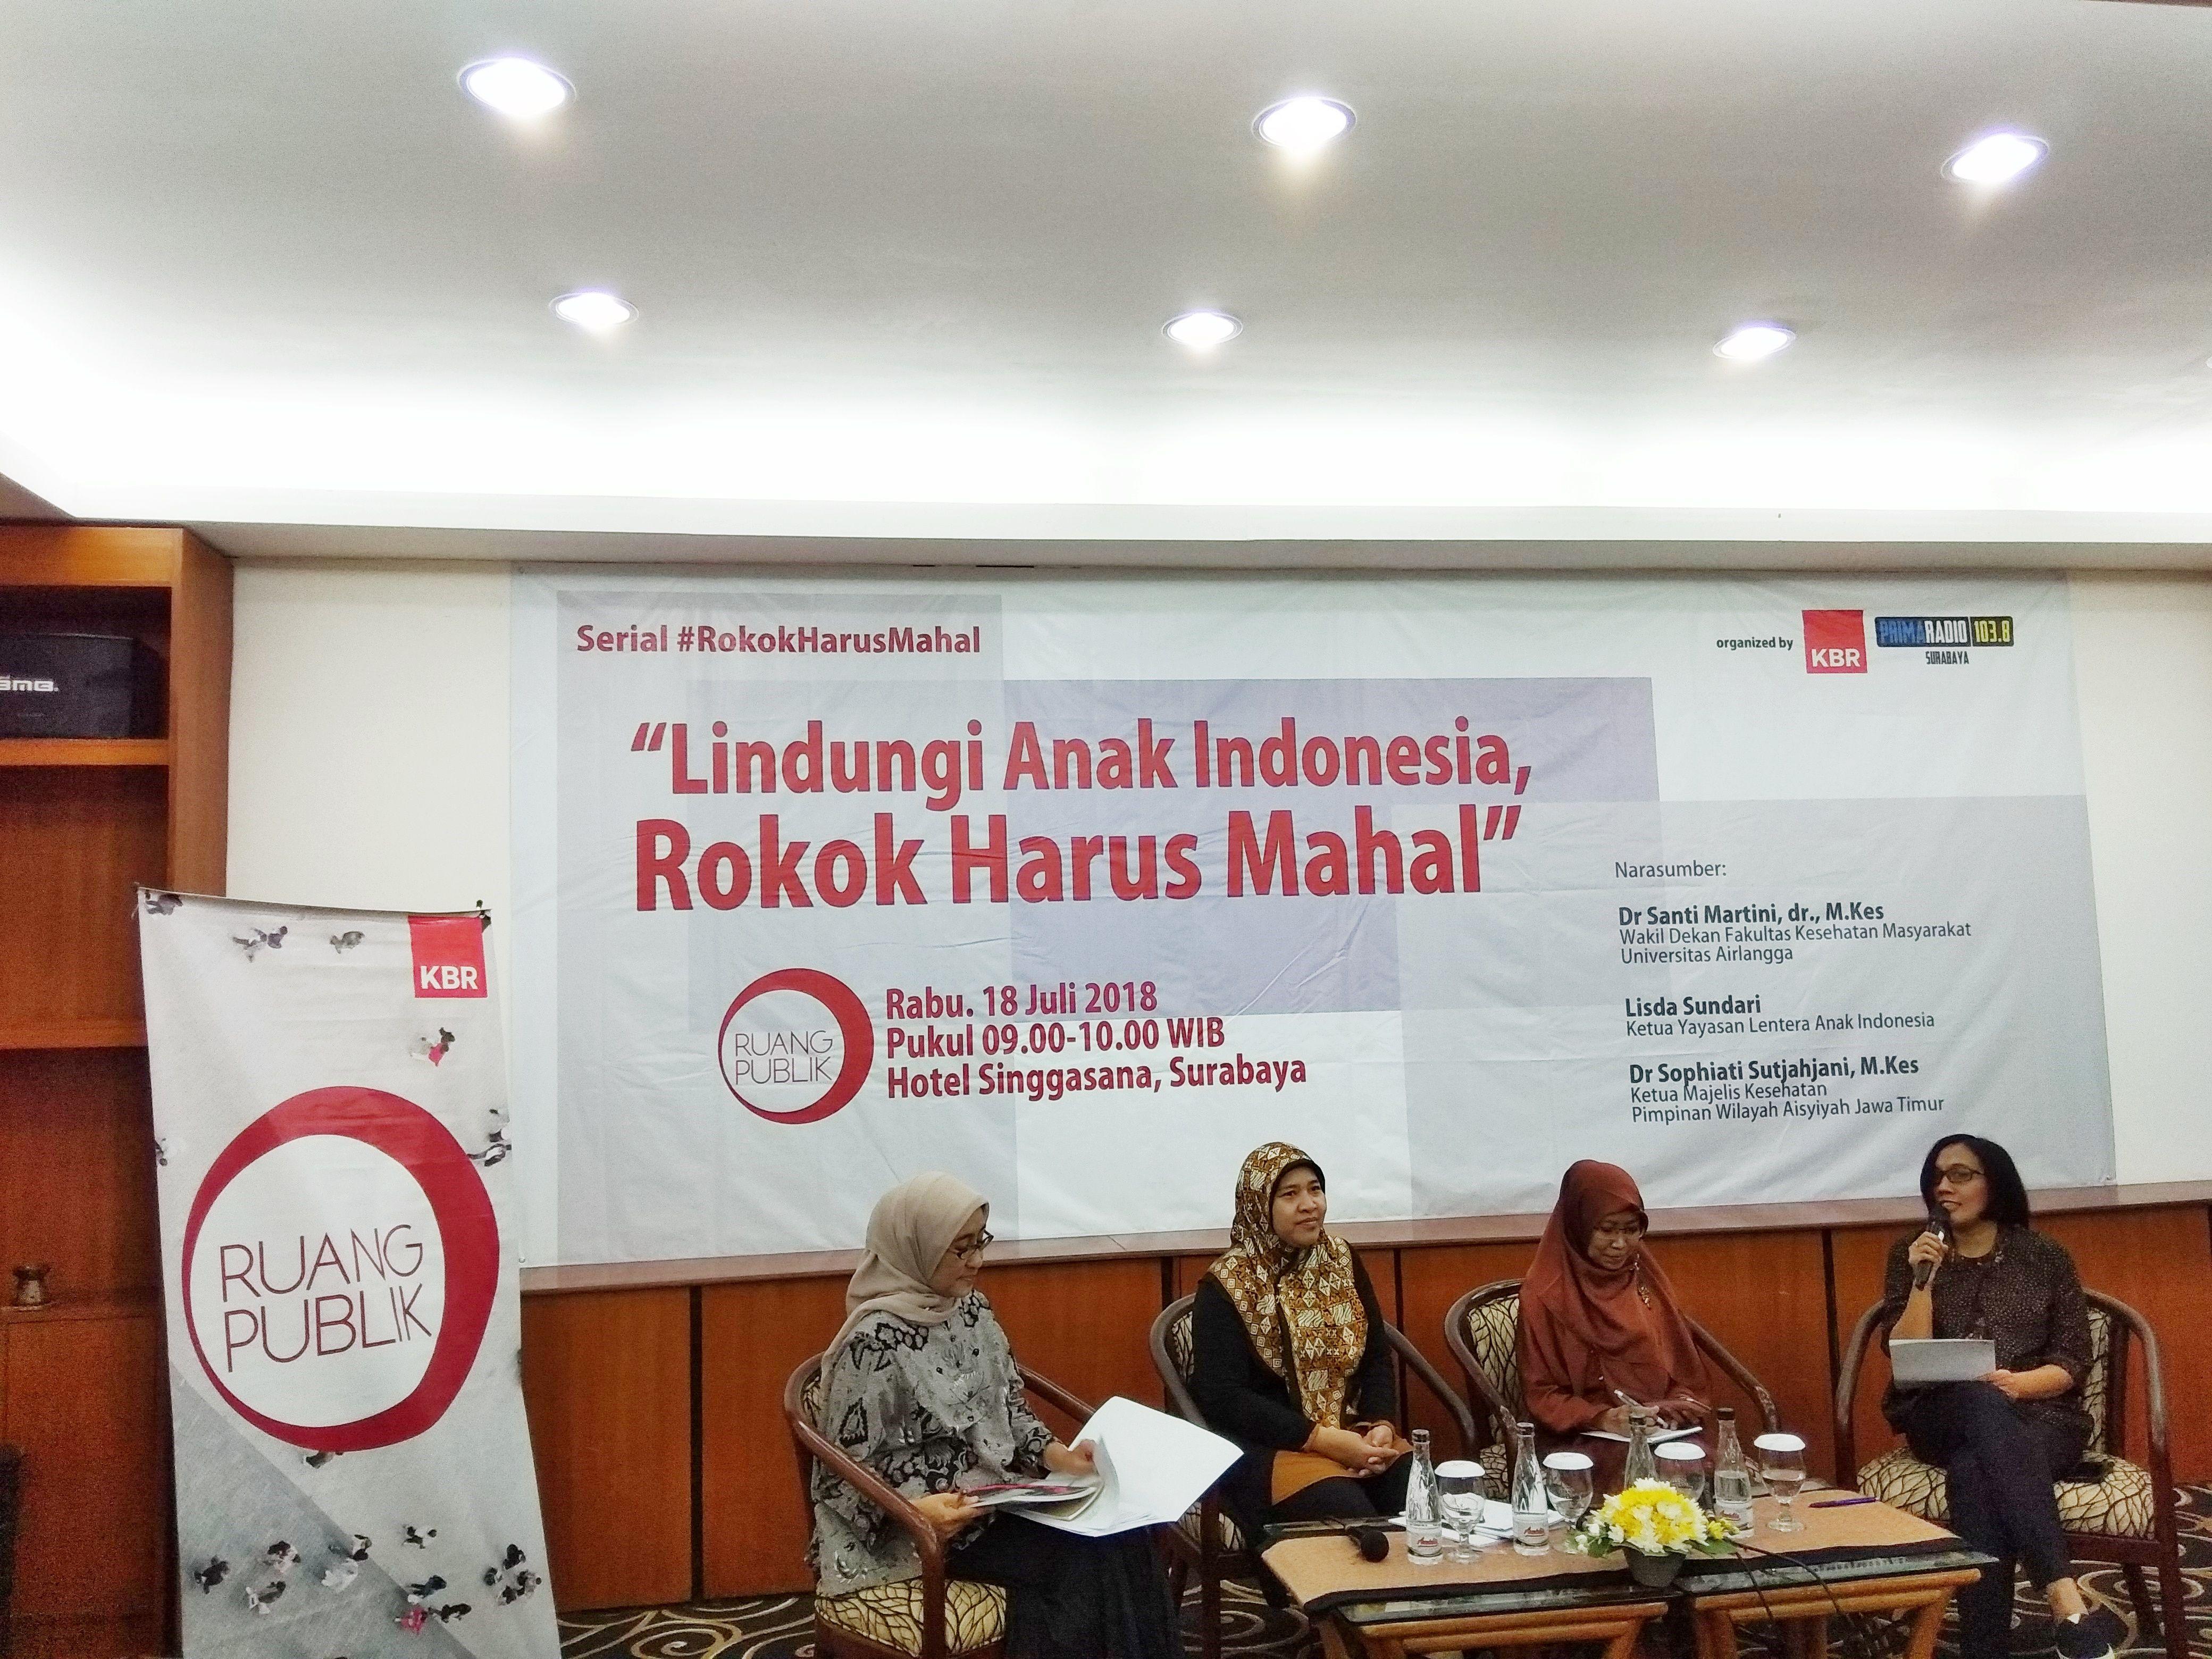 #RokokHarusMahal : Lindungi Anak Indonesia